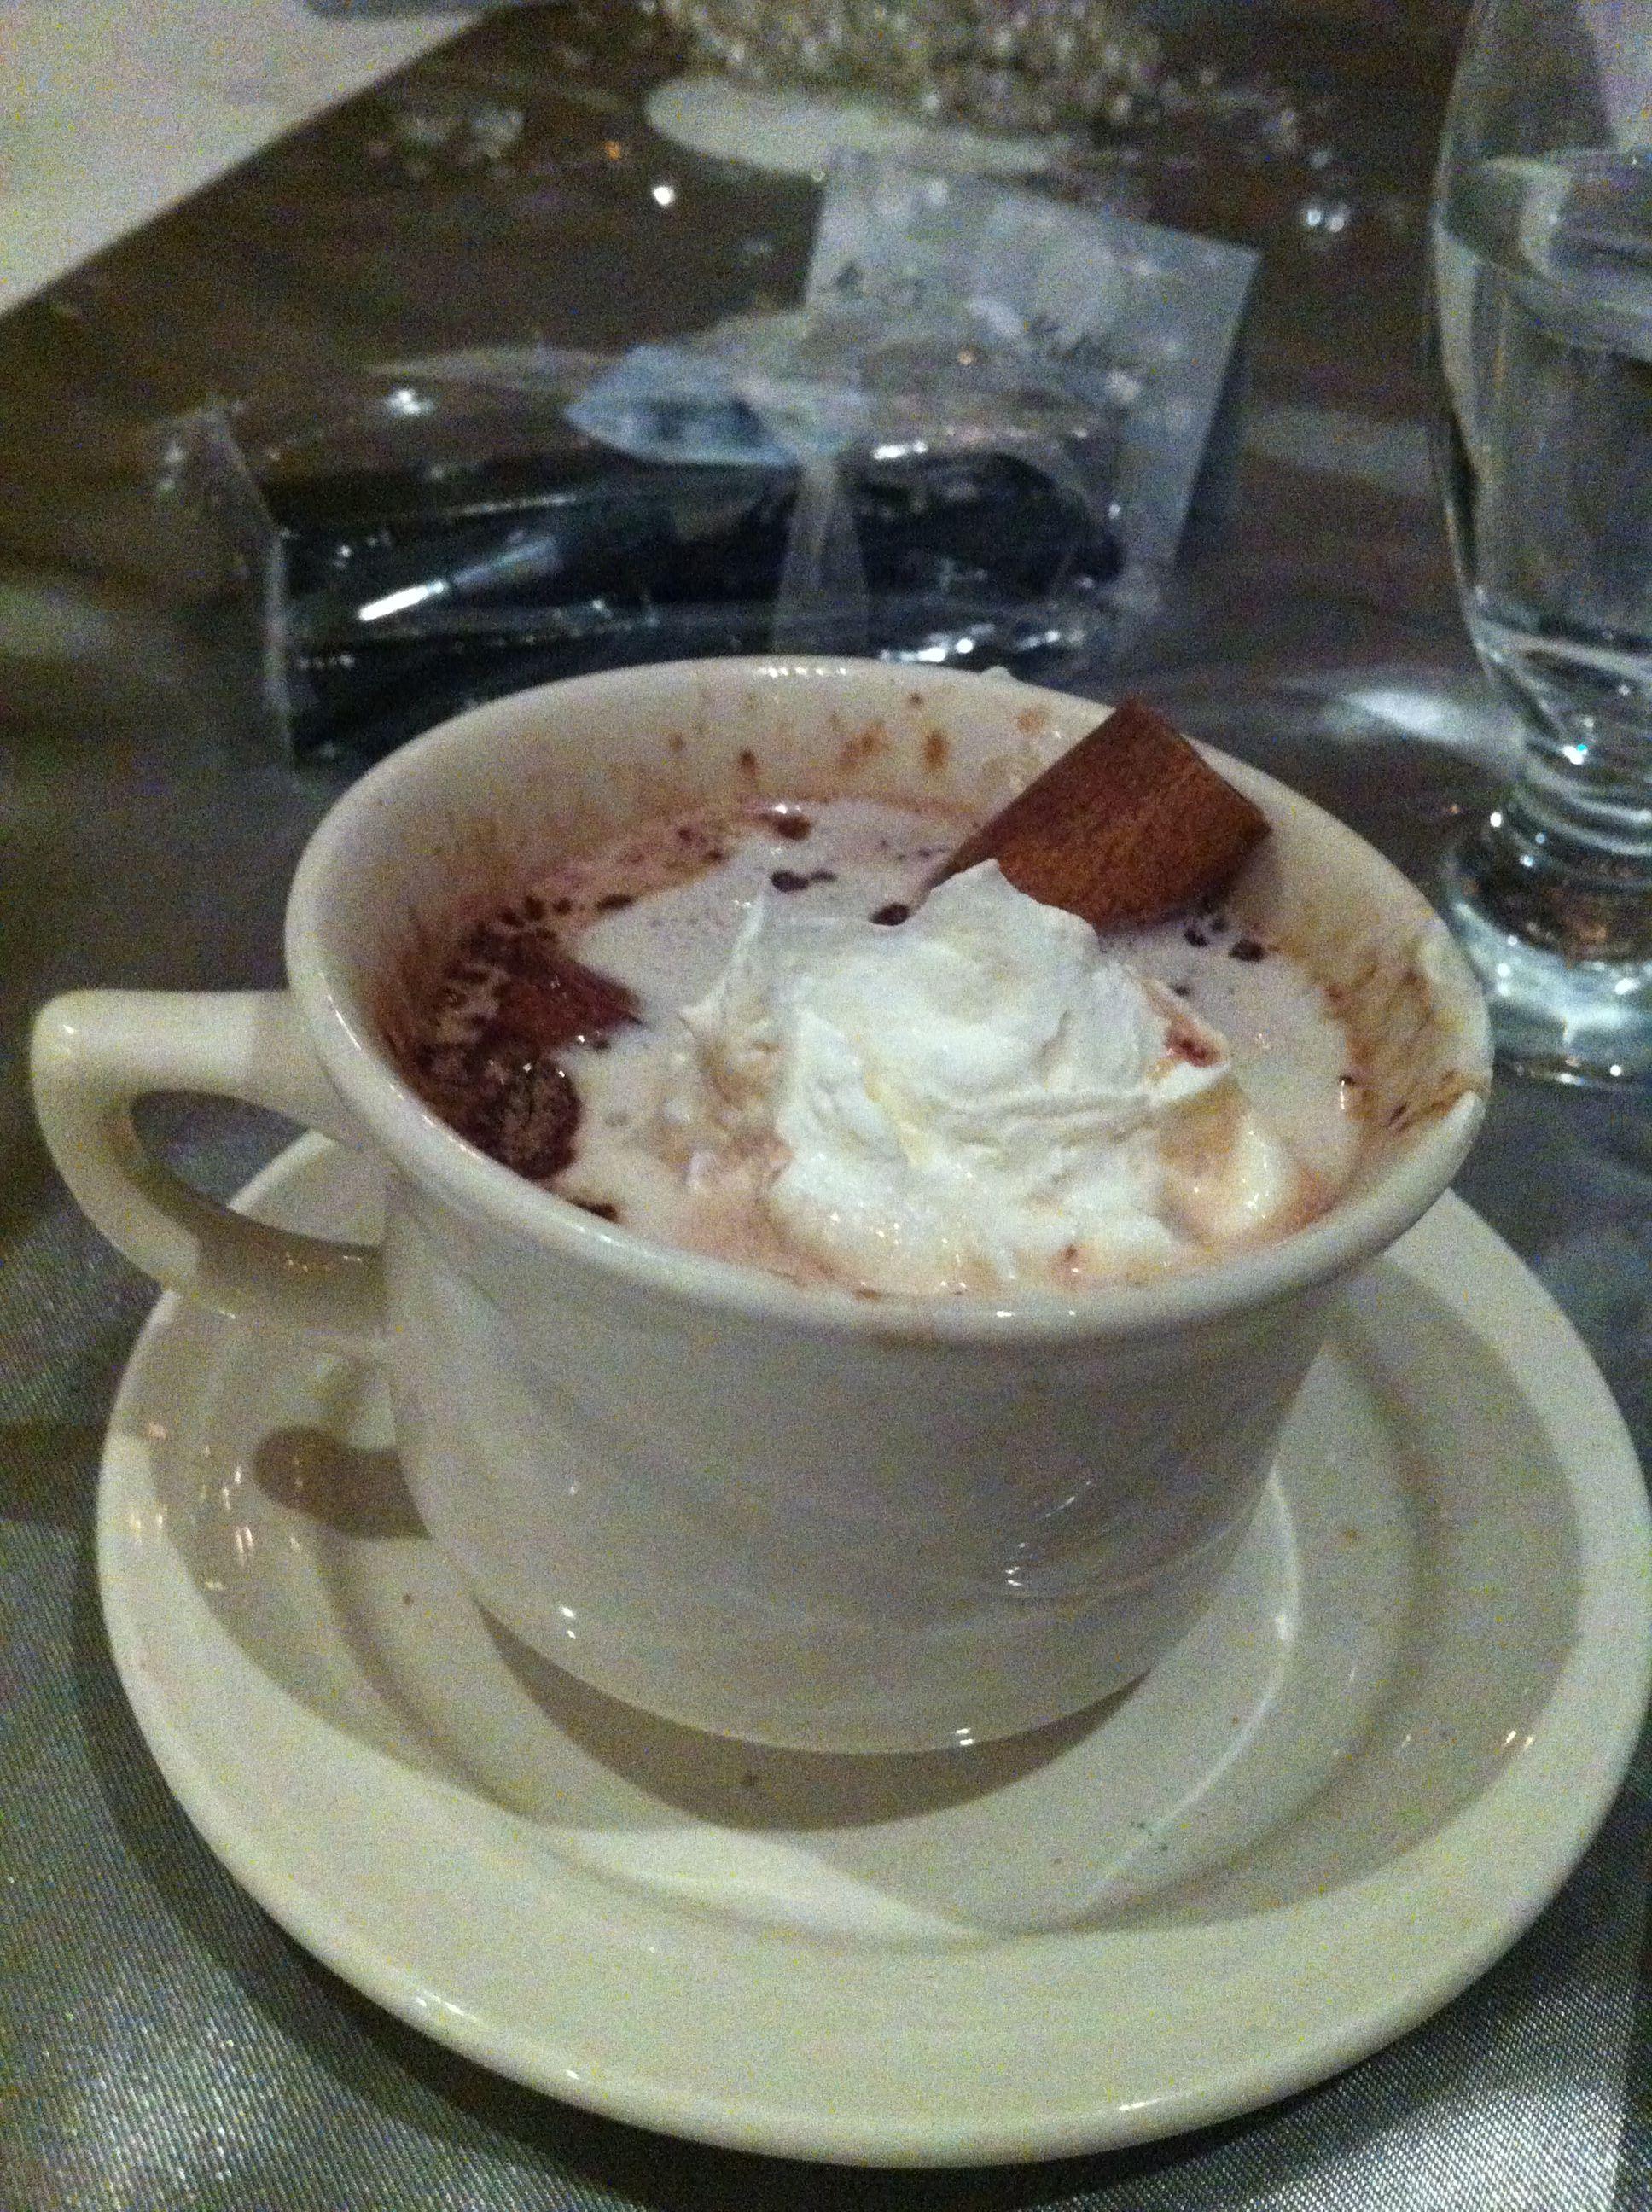 Hot chocolate whipped cream and cinnamon eat hot